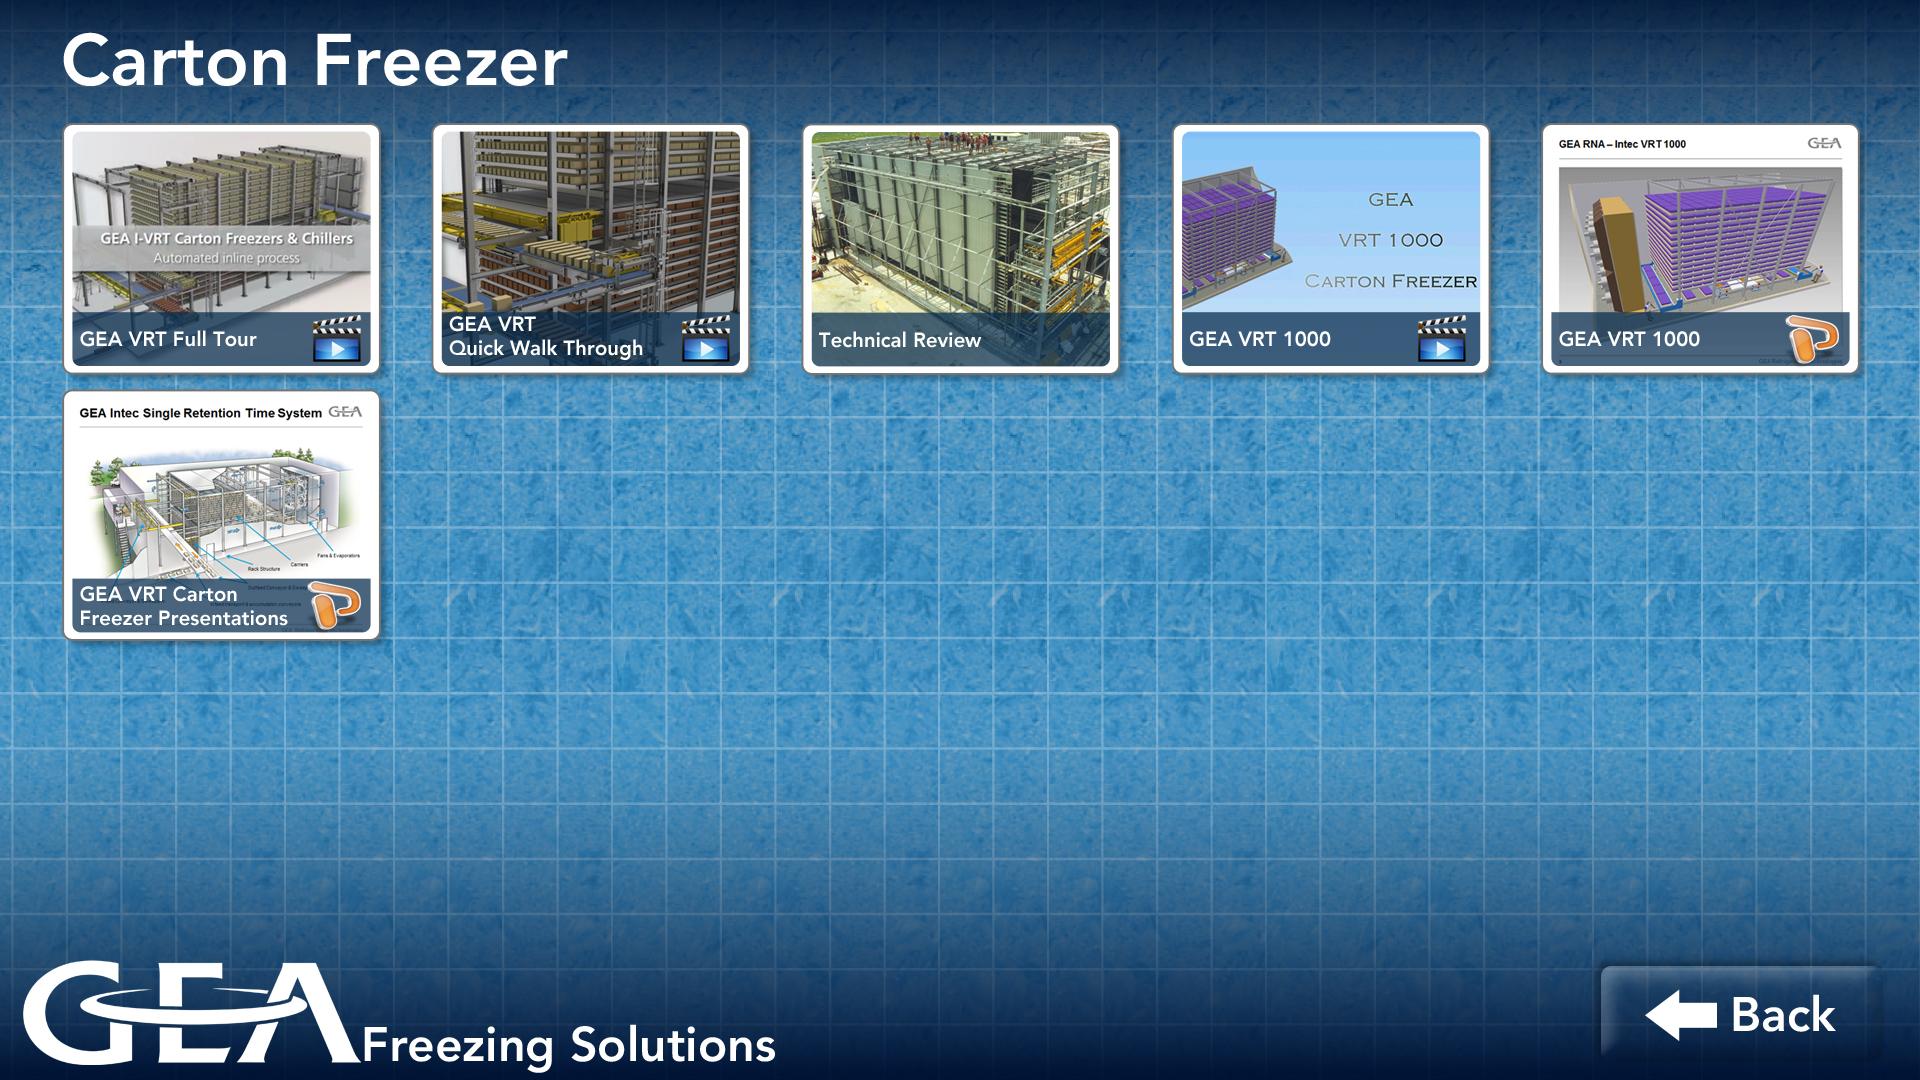 20140122_geascreen2 - Livewire Digital - Kiosk Software